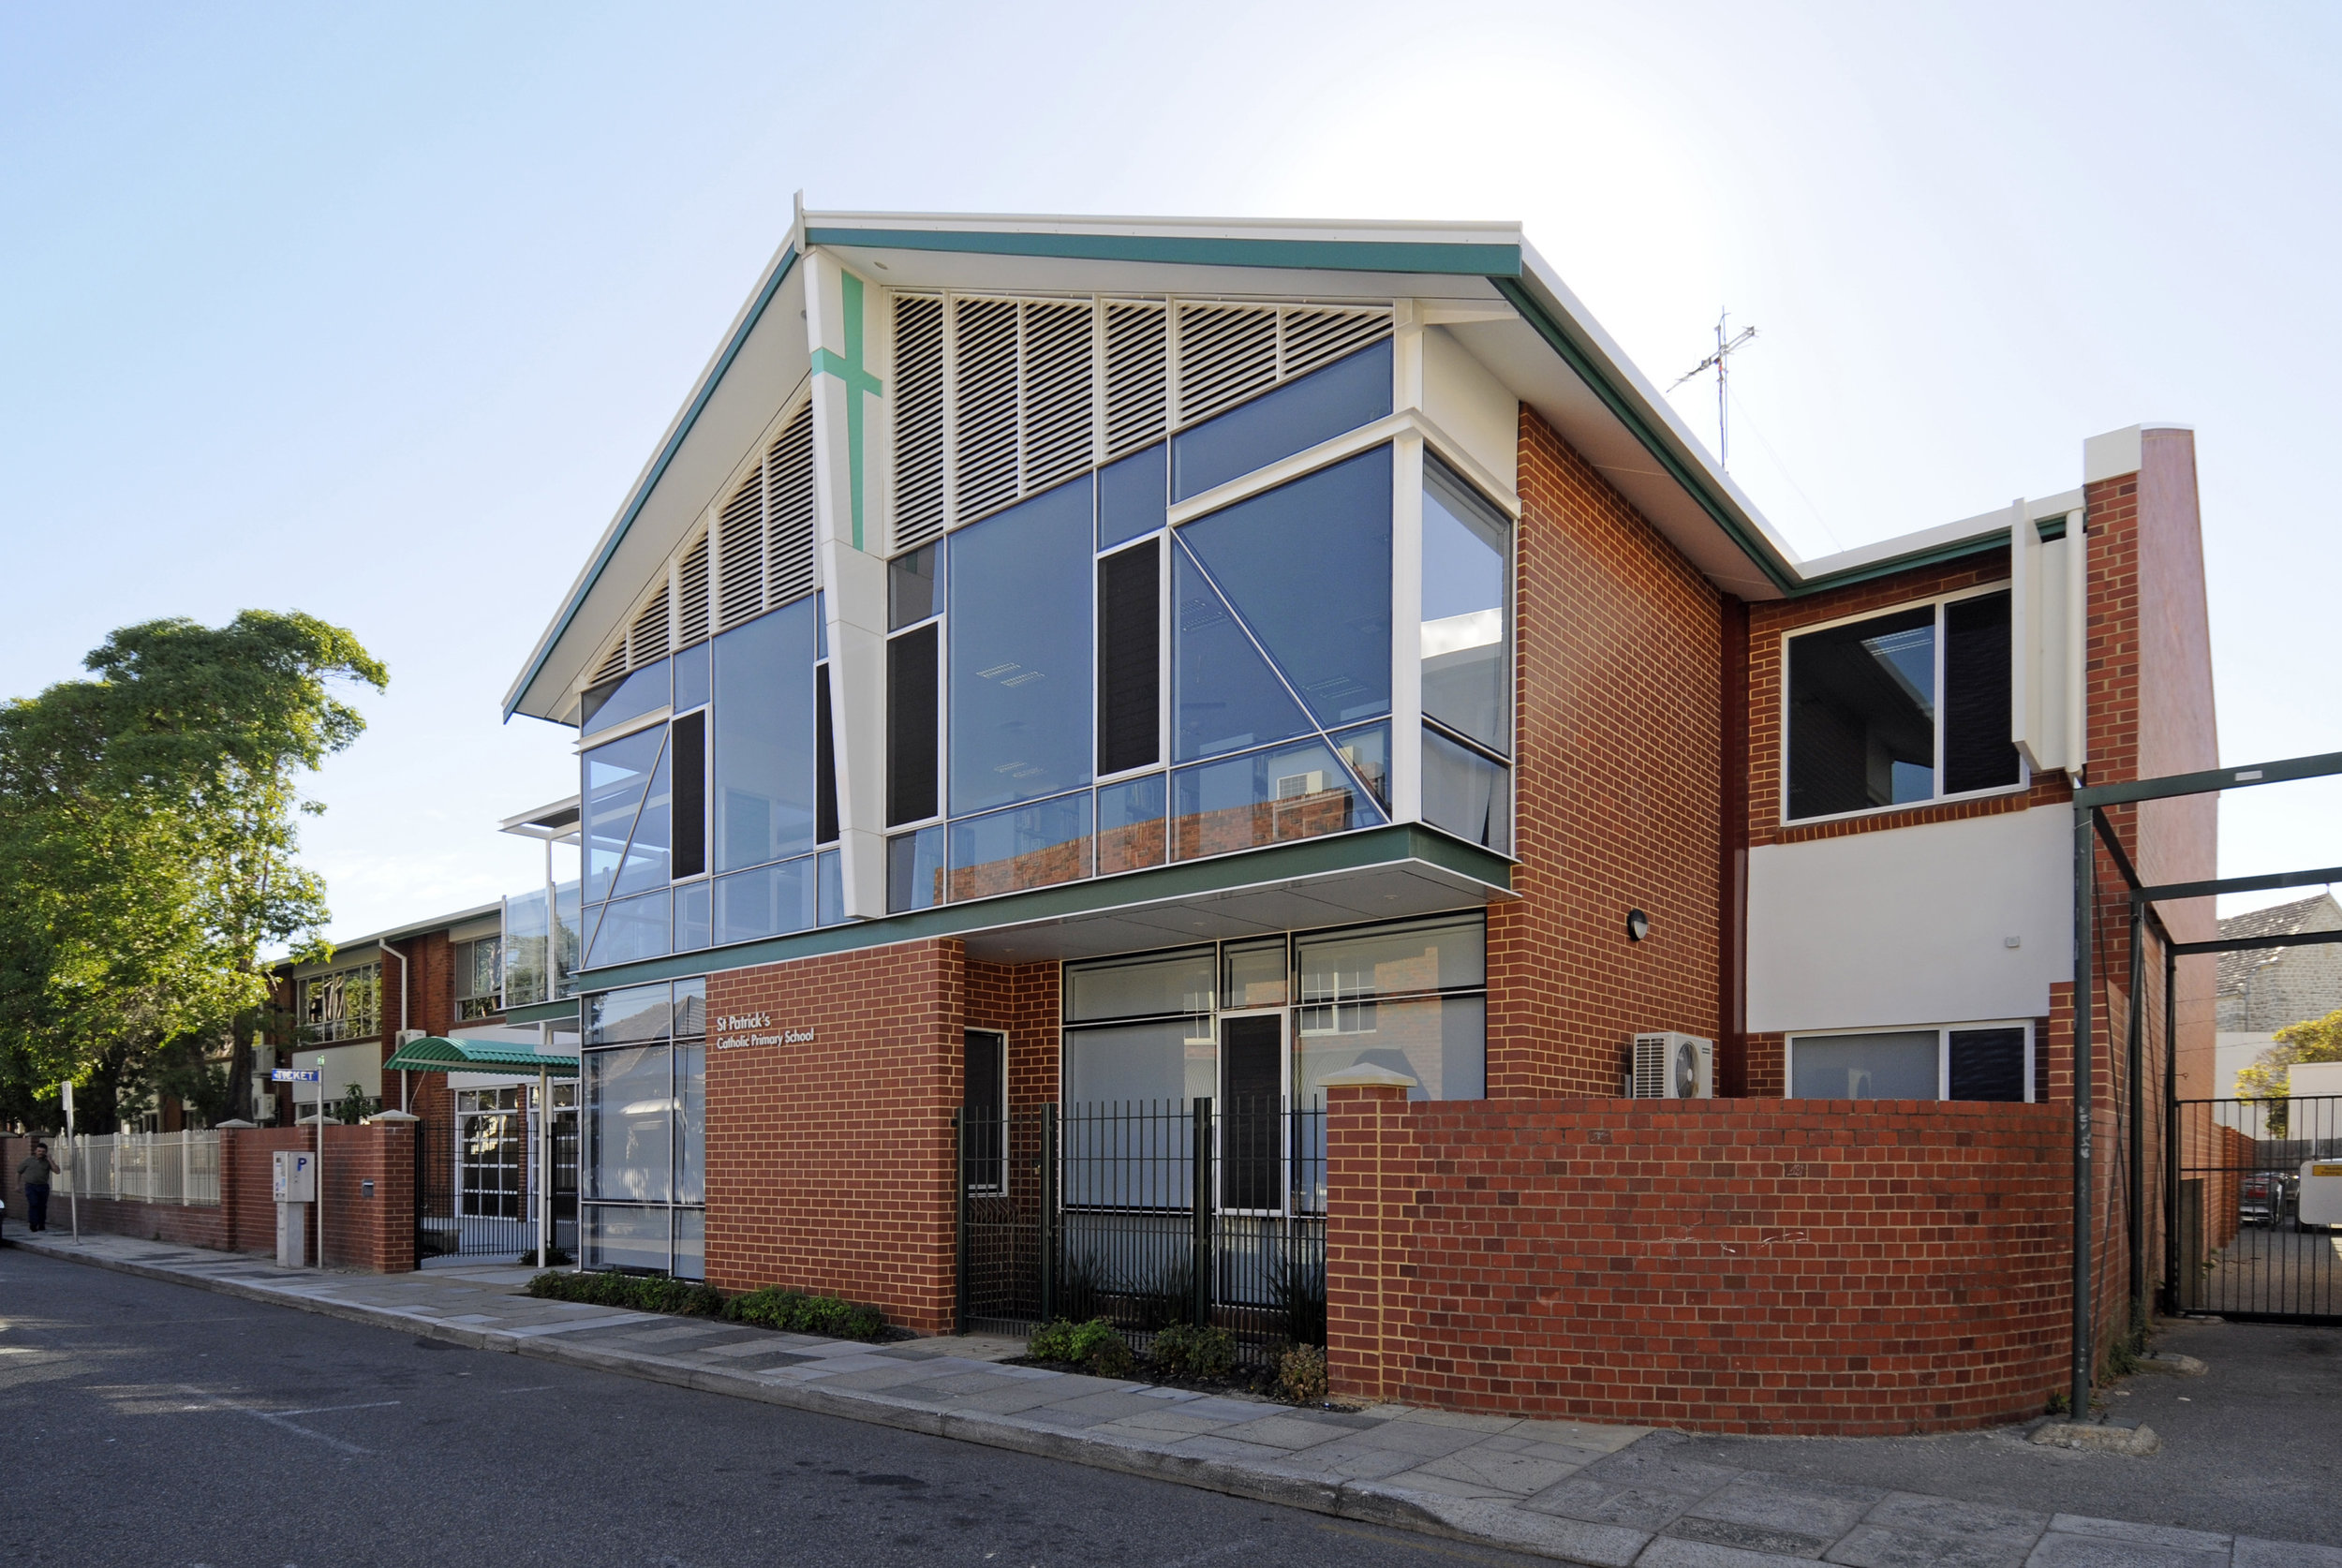 2011 Fremantle heritage festival award | compatible infill development | winnerst patrick's primary school -